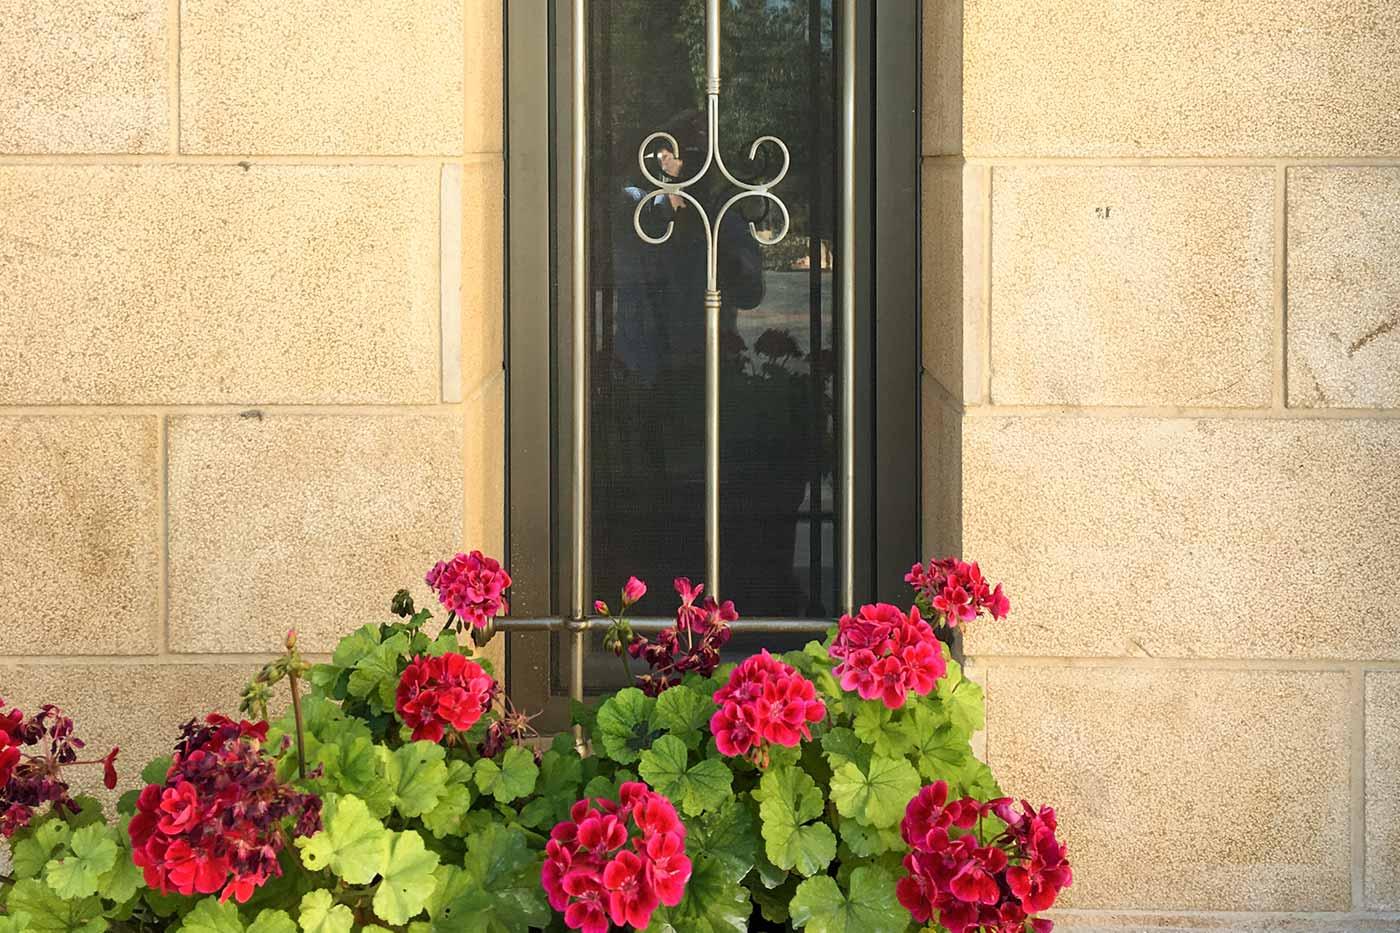 Hisham Merhi Villa - Window with Flowers